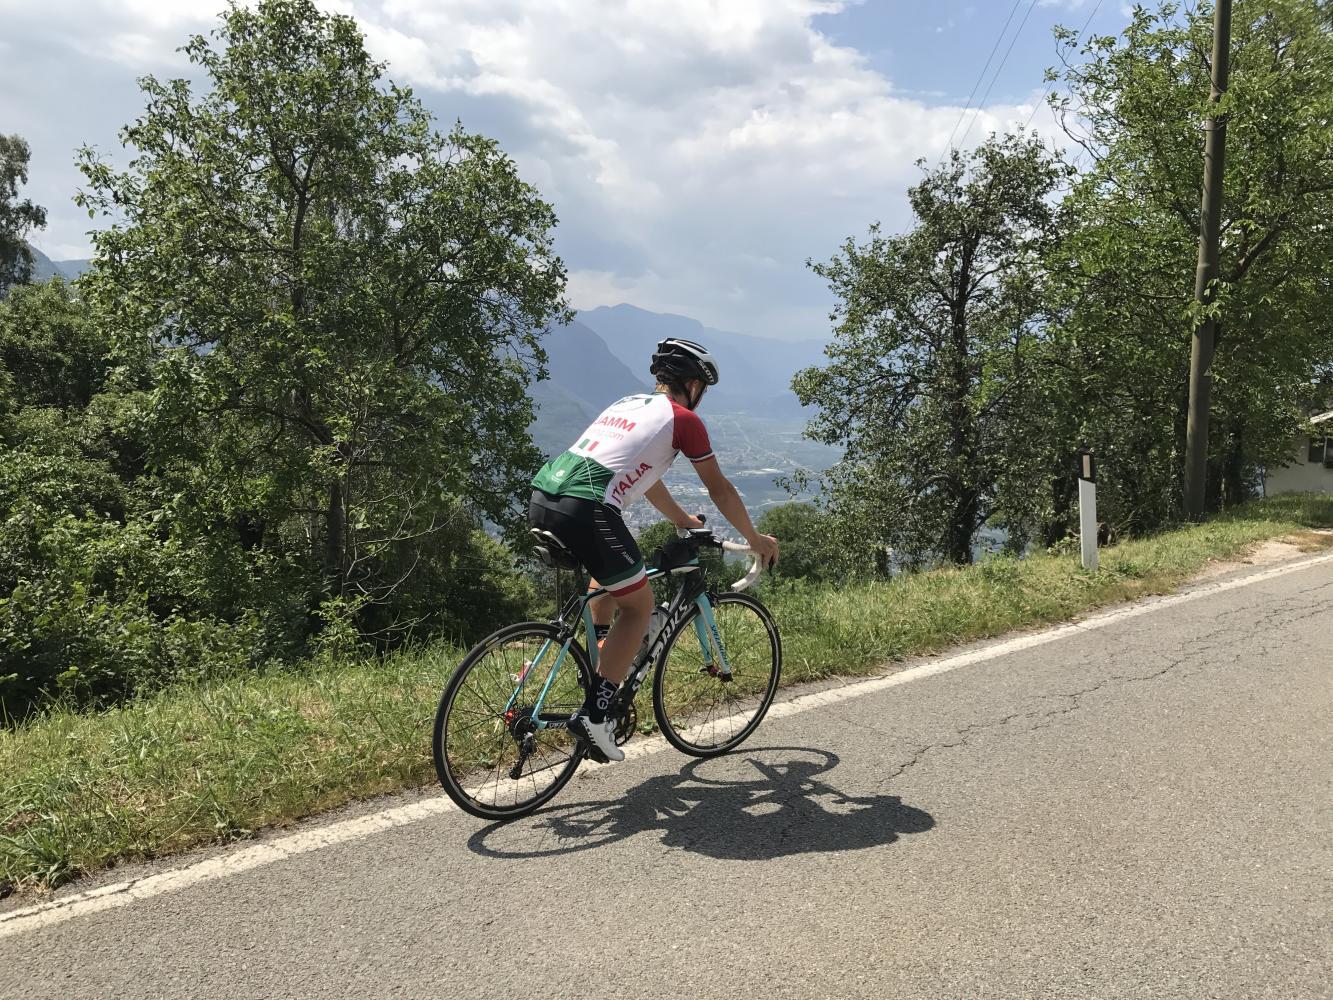 Colle bivio Seit - San Giacomo Bike Climb - PJAMM Cycling